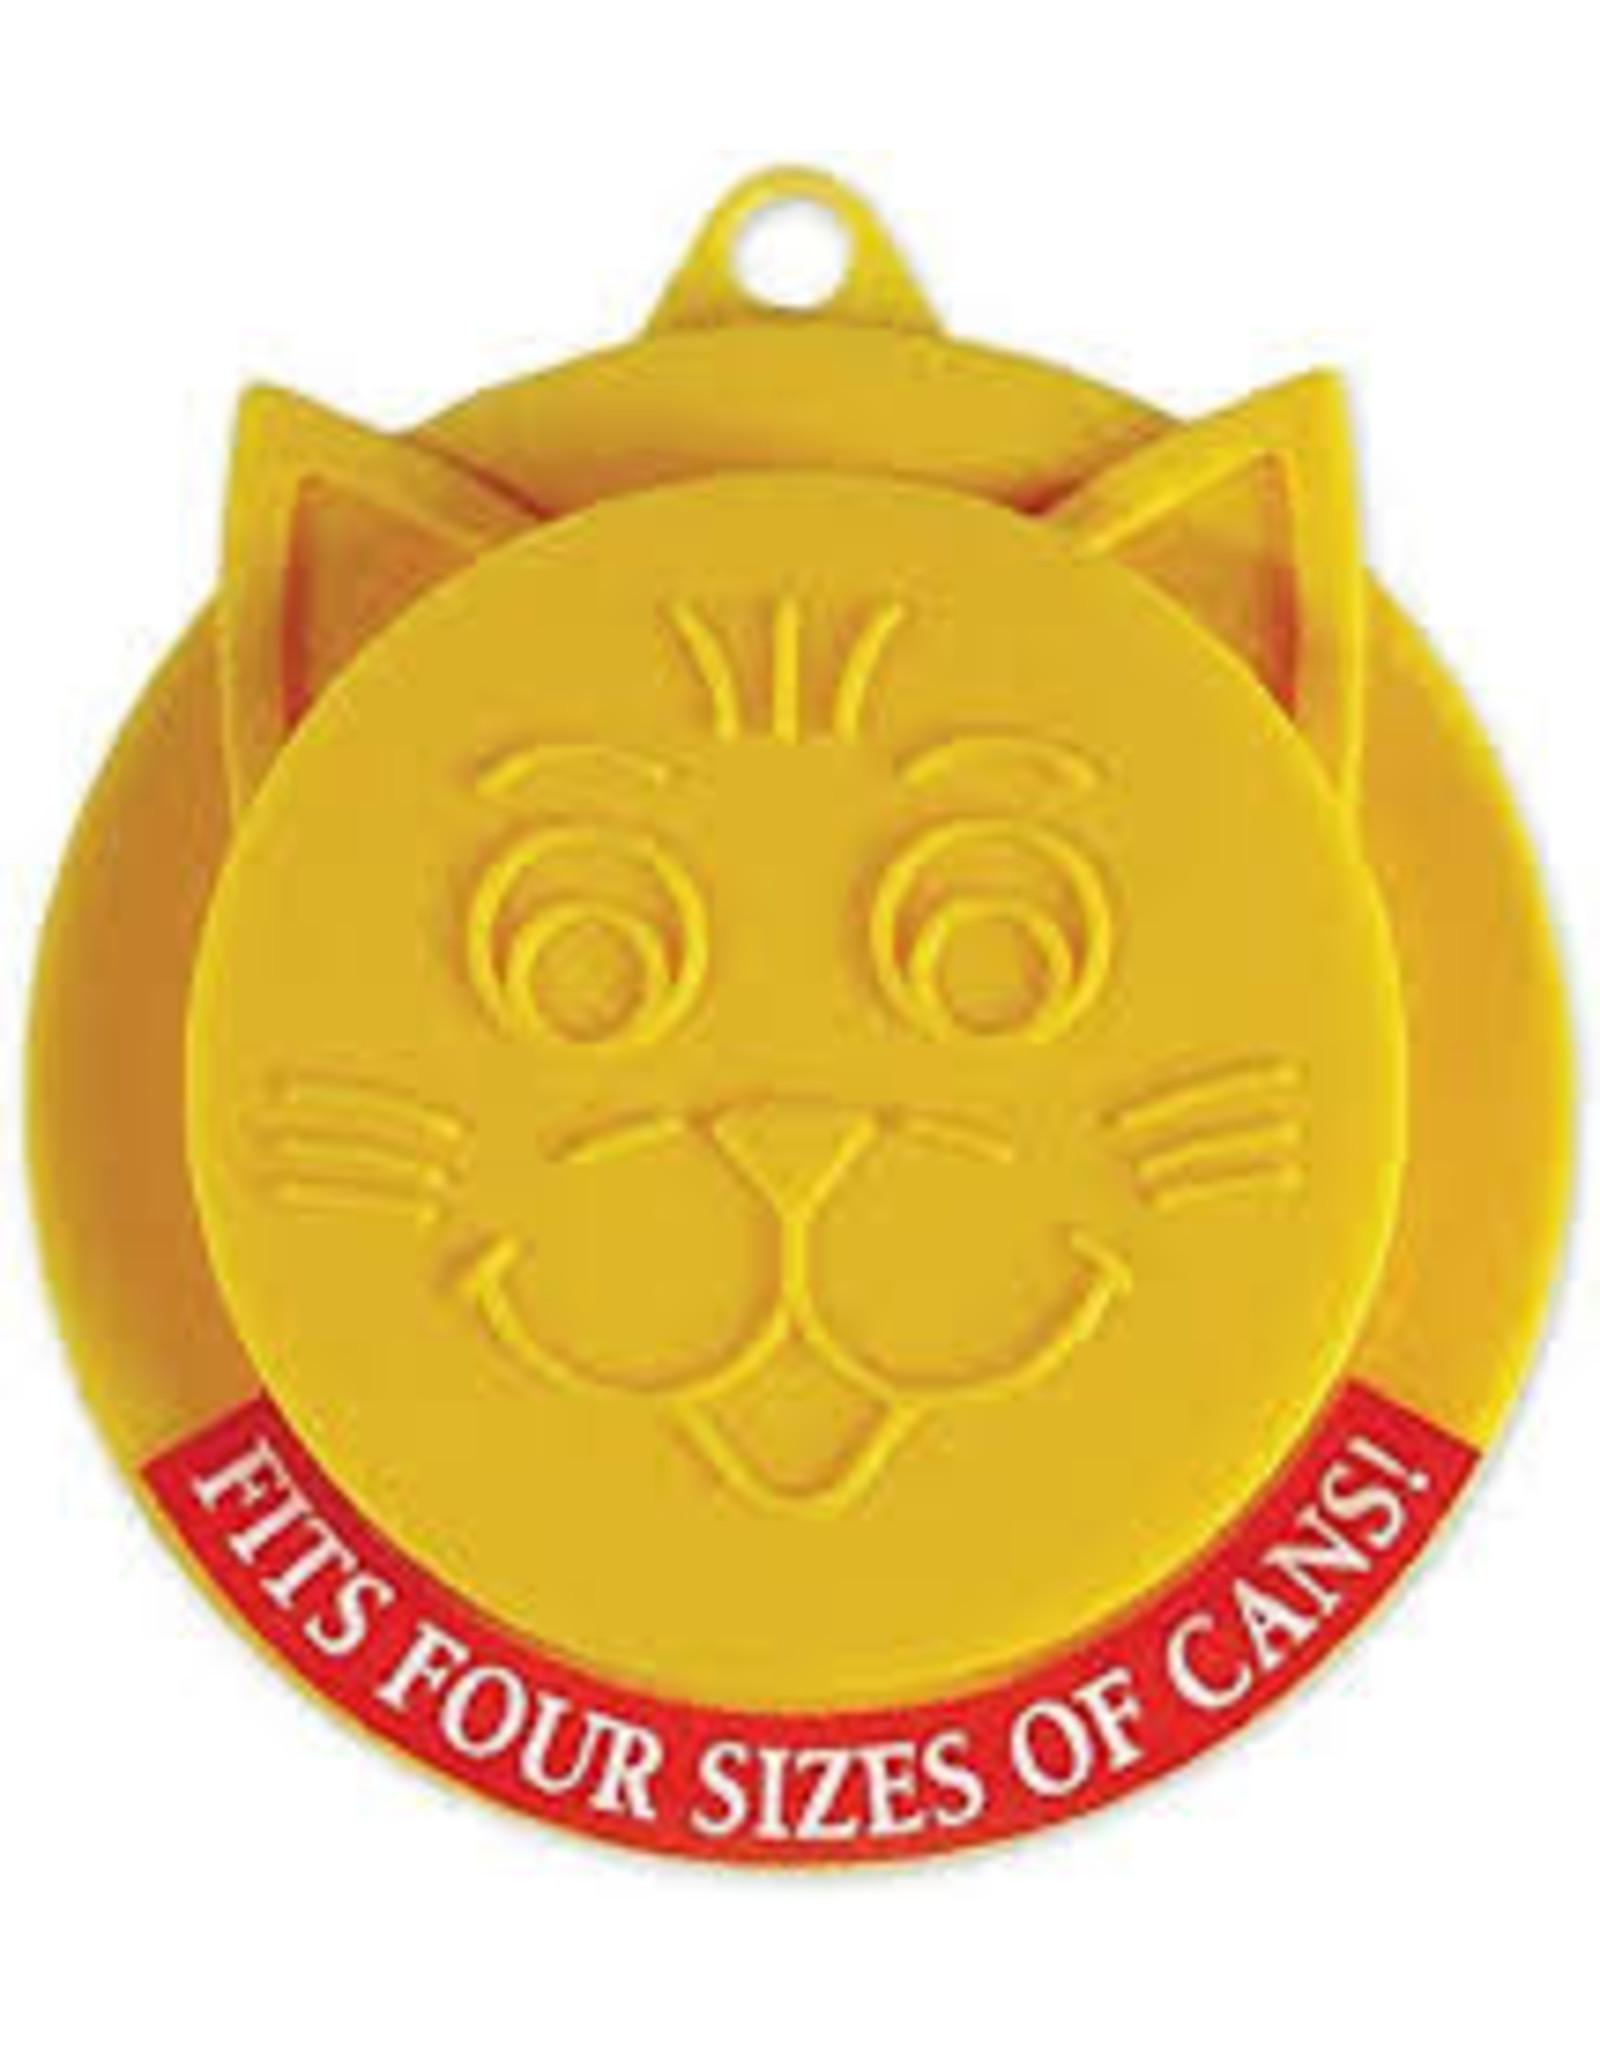 Petmate Petmate Kitty Kaps Pet Food Can Cover